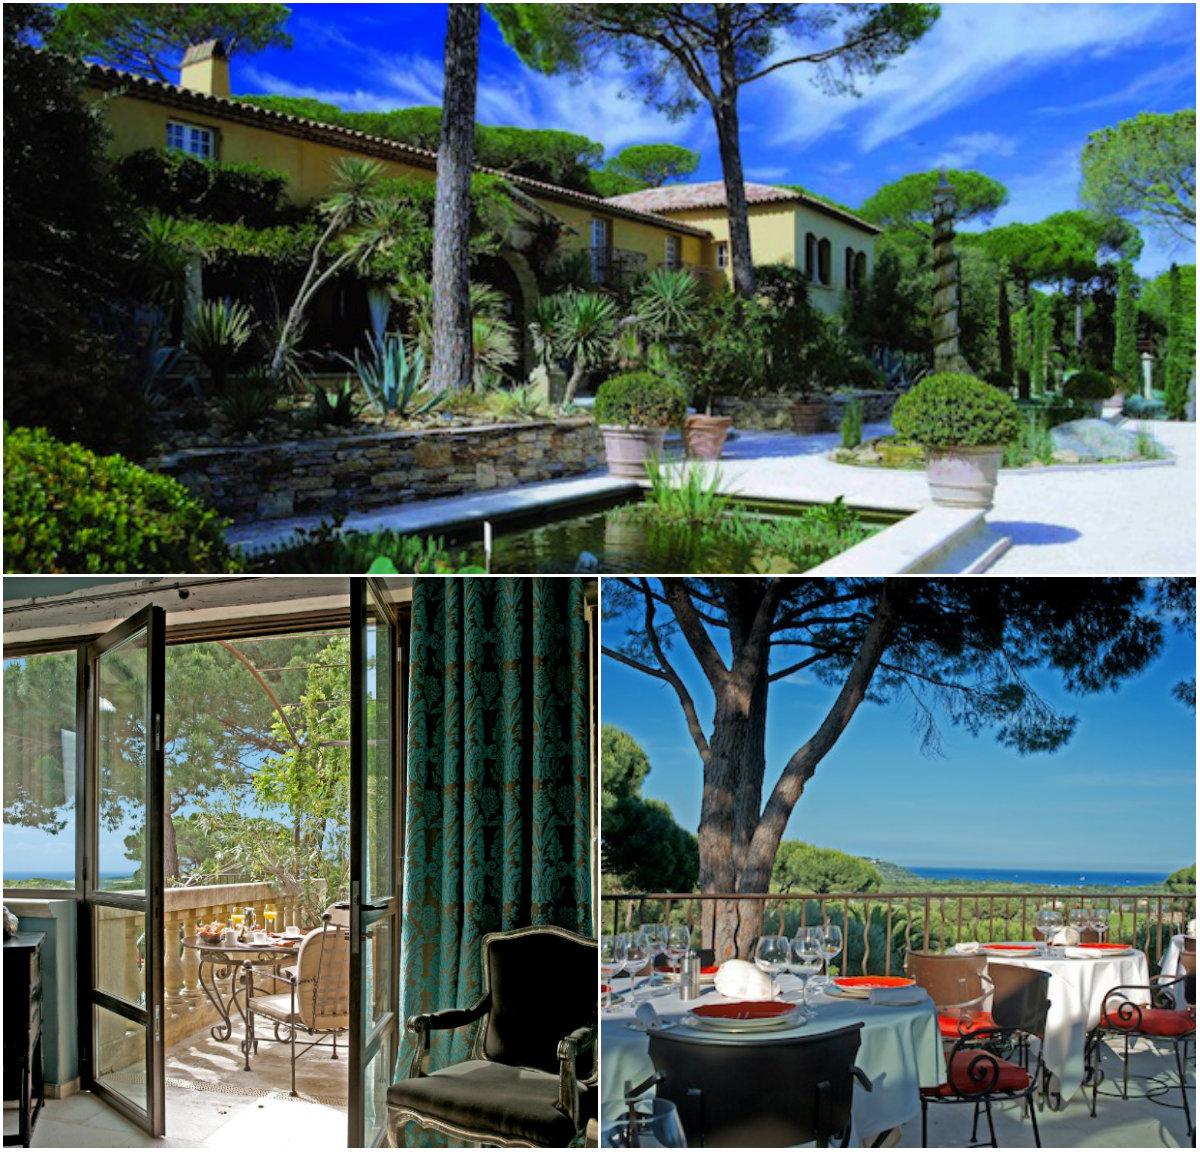 Luxe charmehotel Villa Marie bij Saint tropez